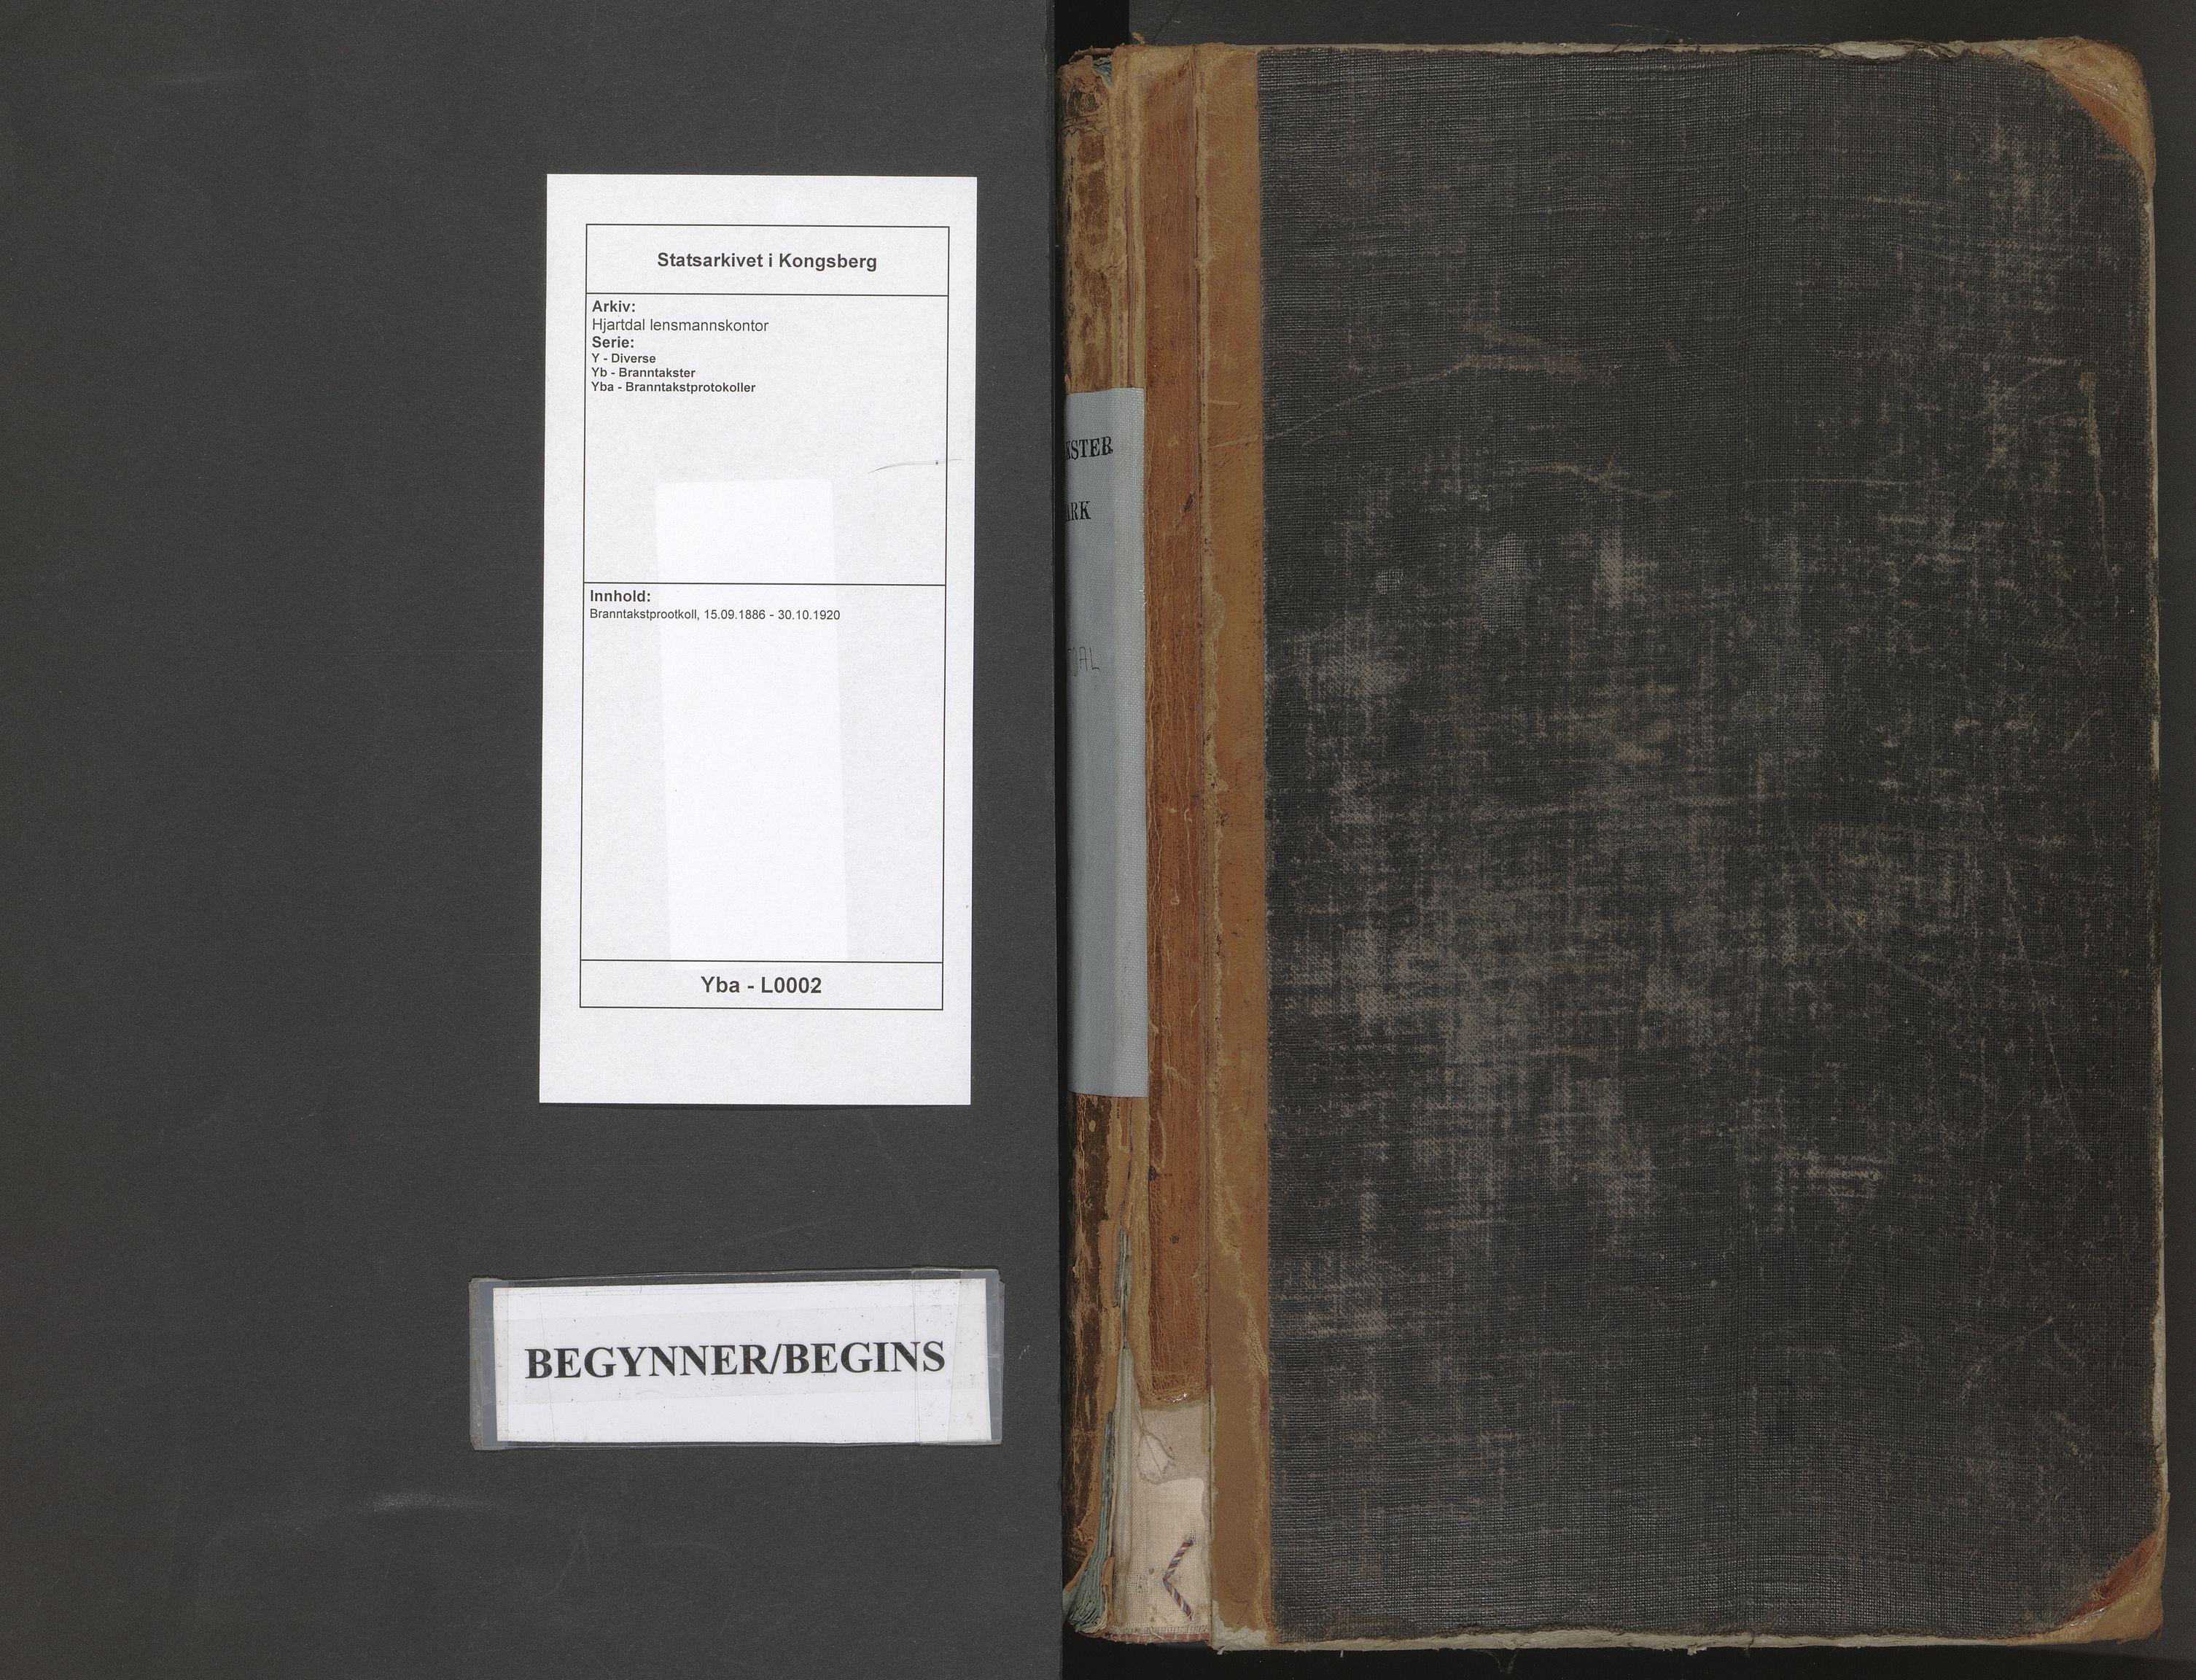 SAKO, Hjartdal lensmannskontor, Y/Yb/Yba/L0002: Branntakstprootkoll, 1886-1920